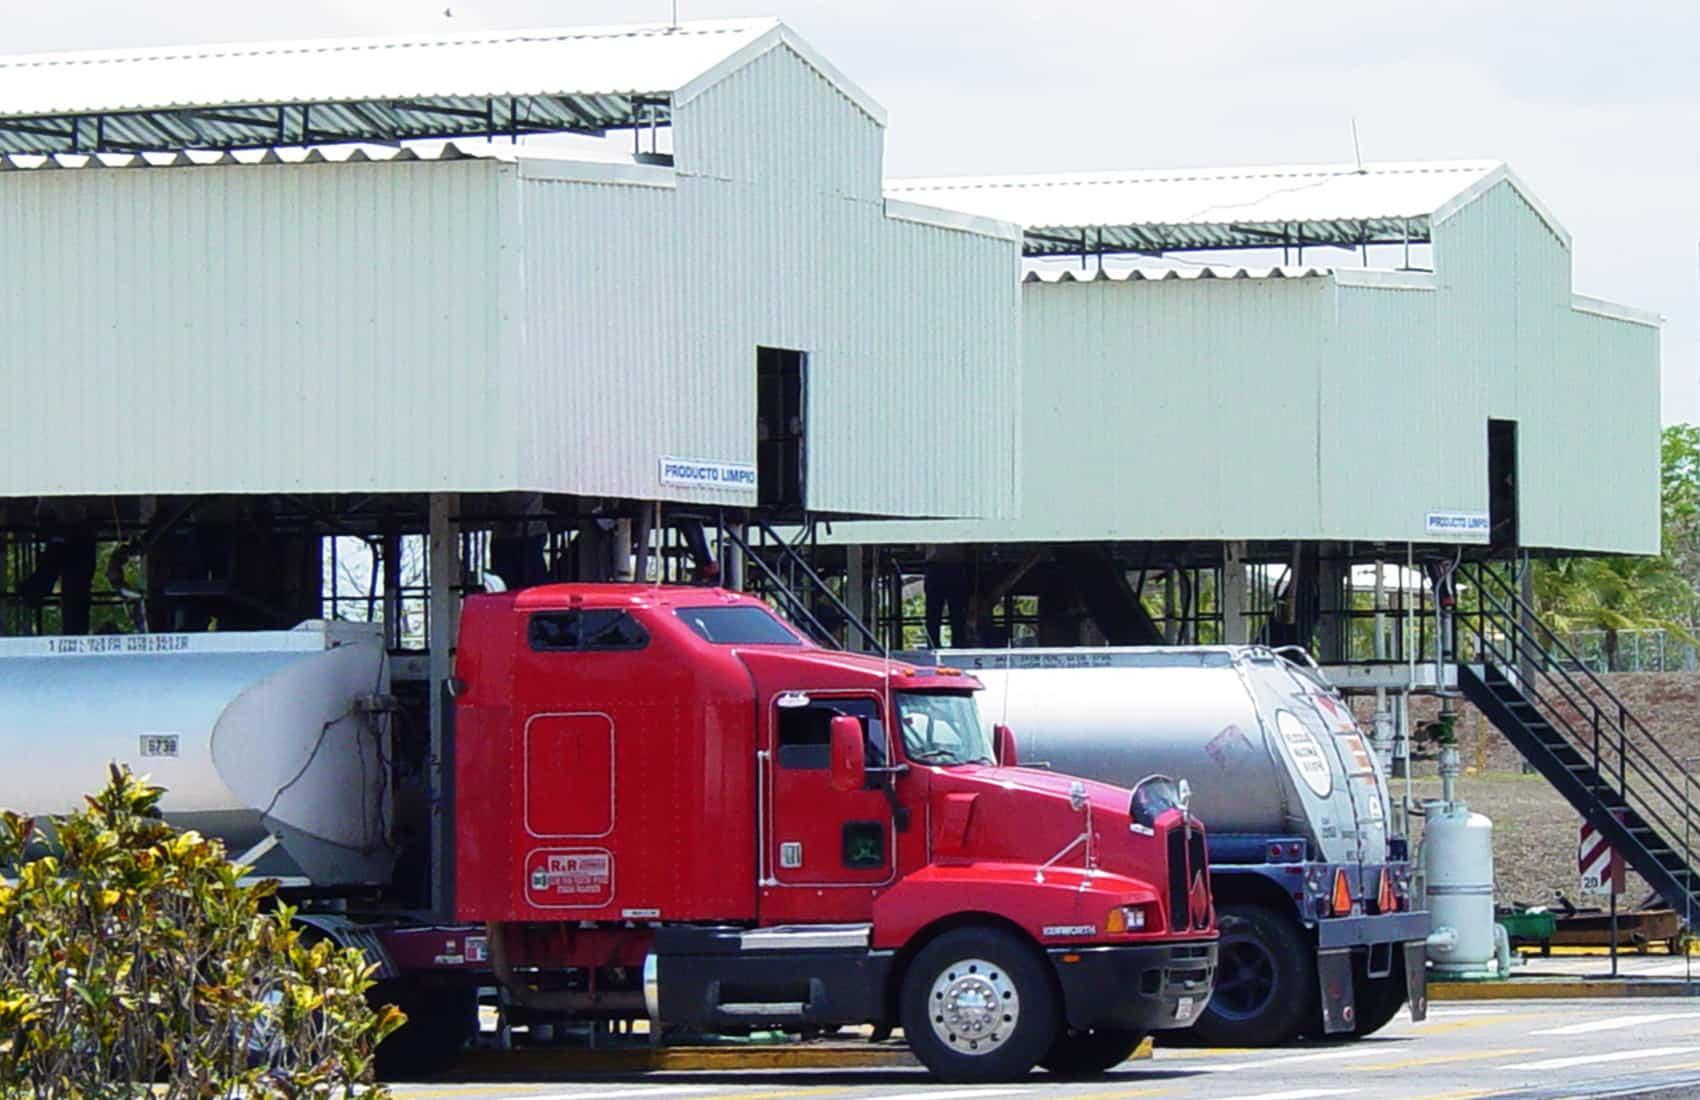 Propane distribution trucks